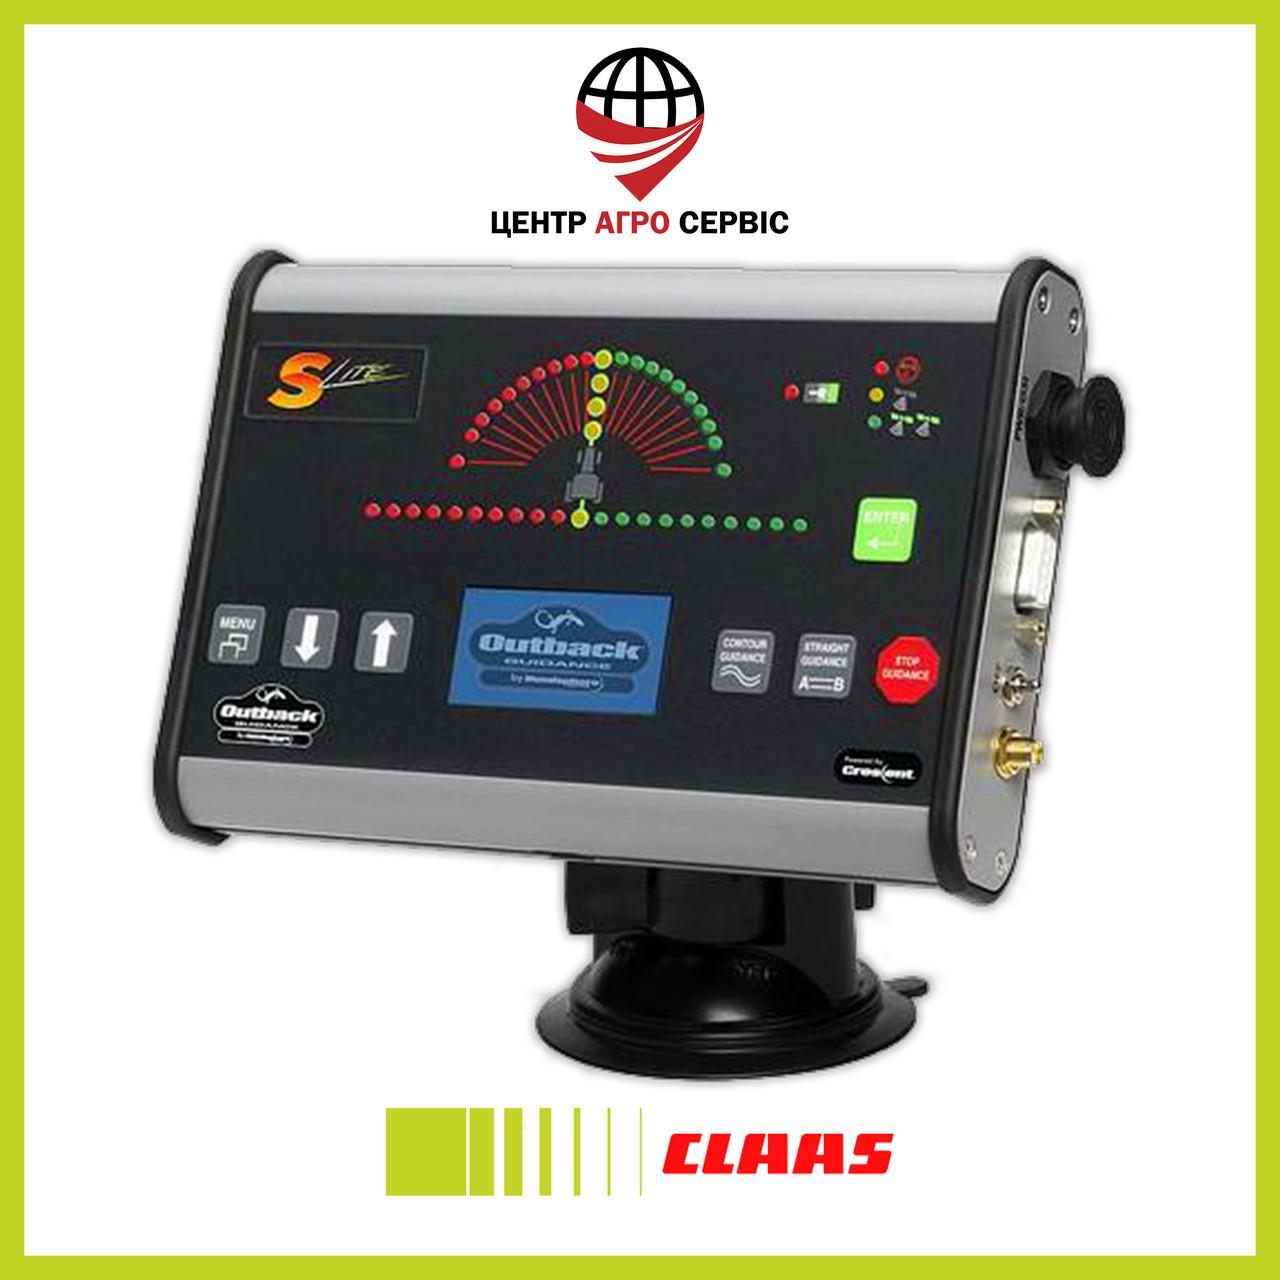 Gps навигатор для трактора (навигатор для поля, сельхоз навигатор)  Клас аутбек